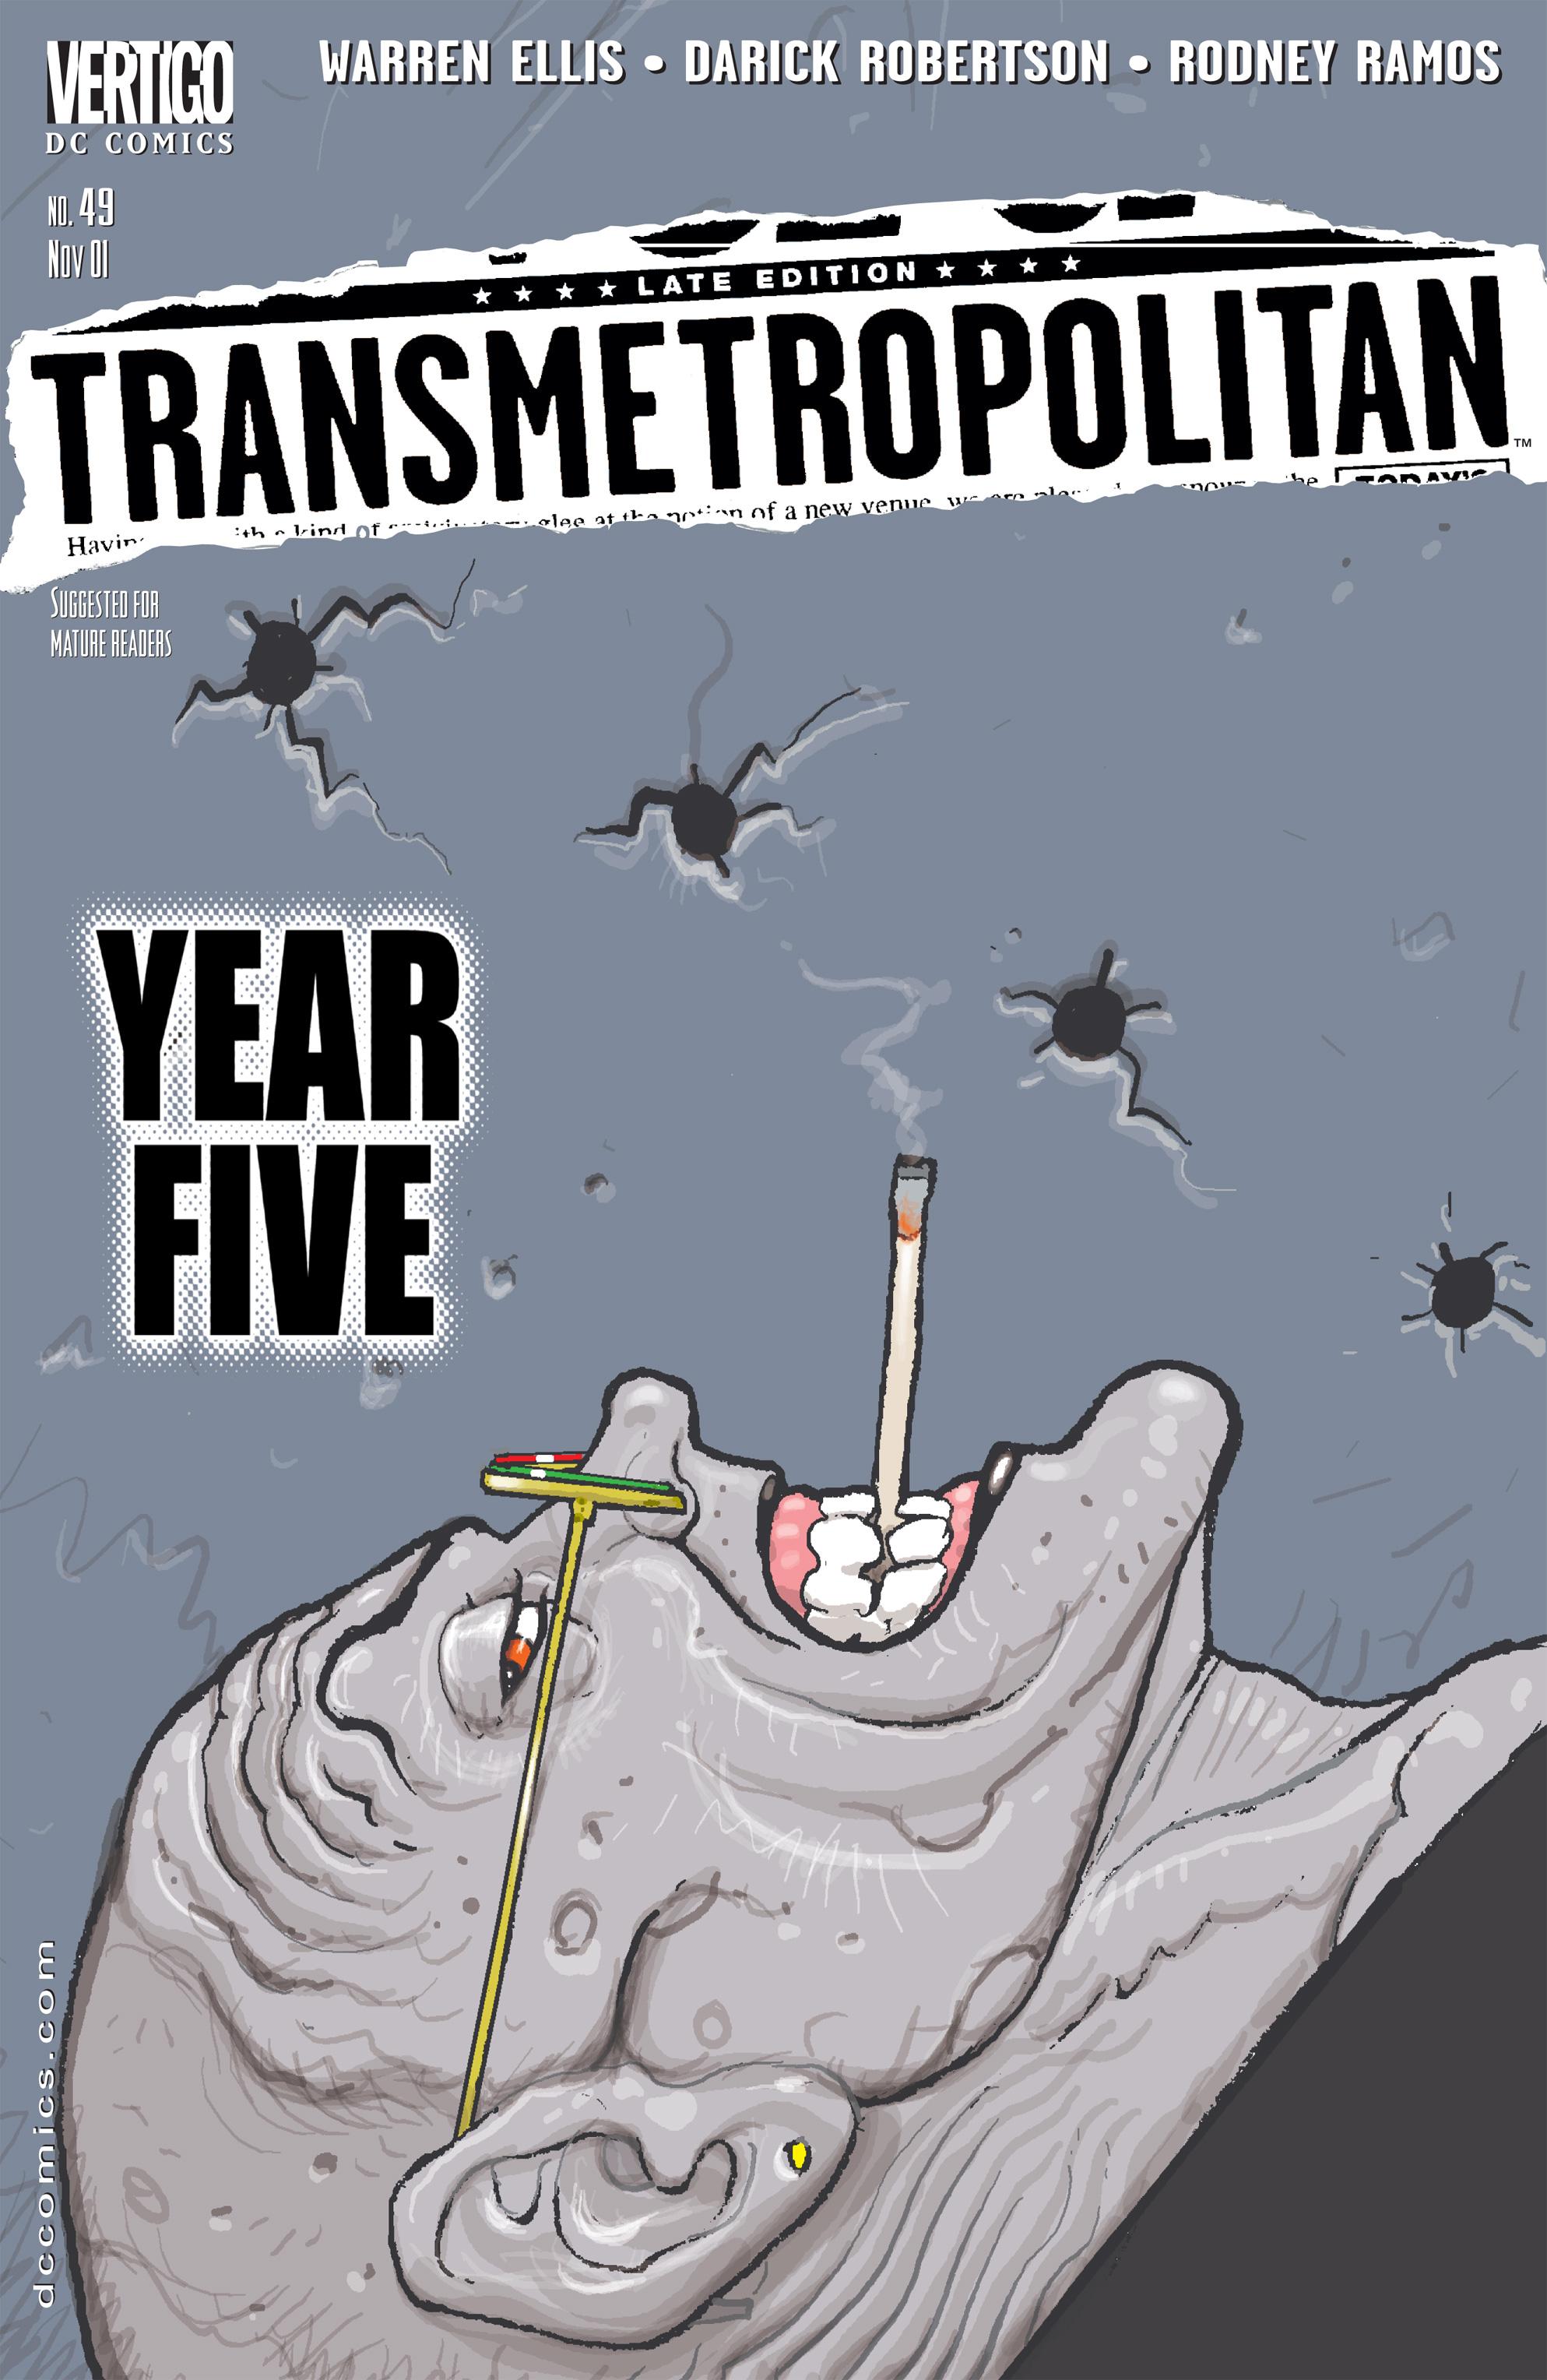 Read online Transmetropolitan comic -  Issue #49 - 1